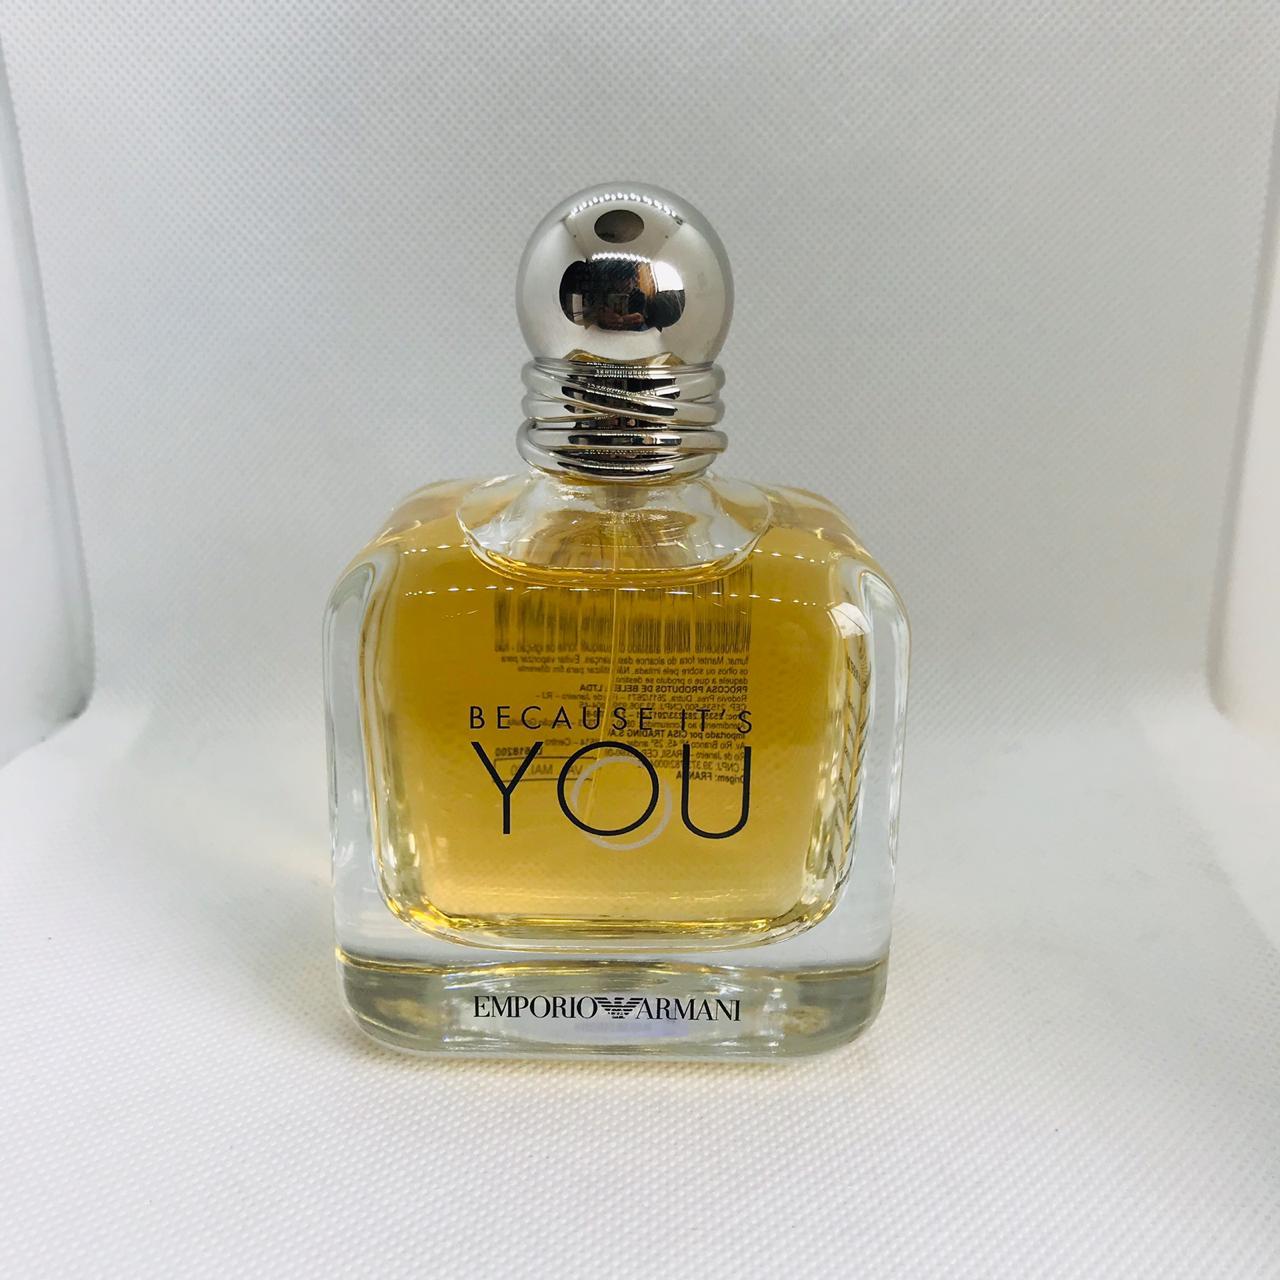 Because It's You Emporio Armani Femino Eau de Parfum - Tester 100 ml